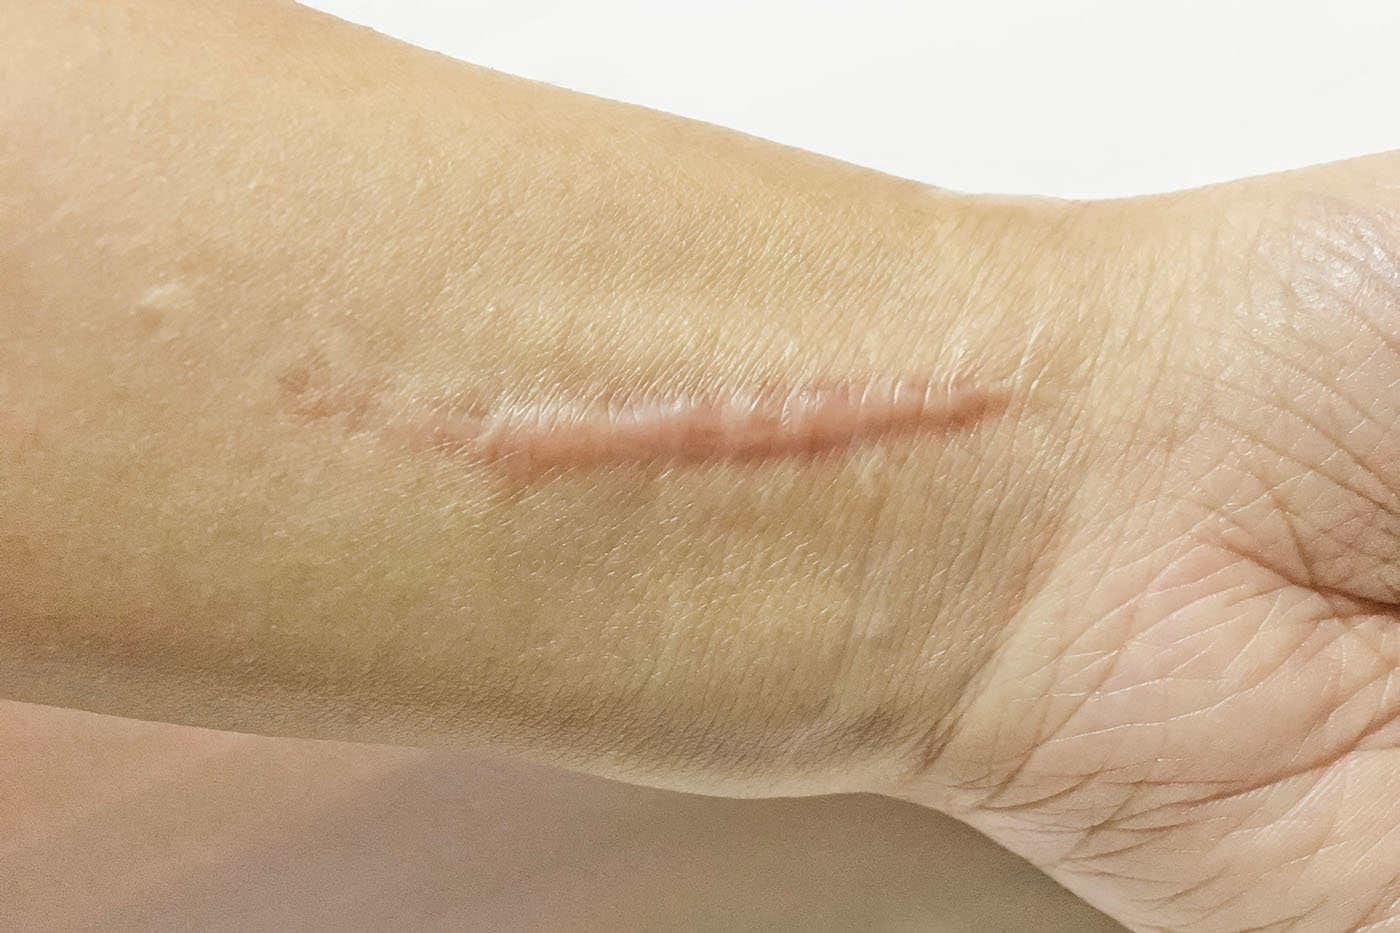 Cicatrici - tipuri, tratament și prevenție